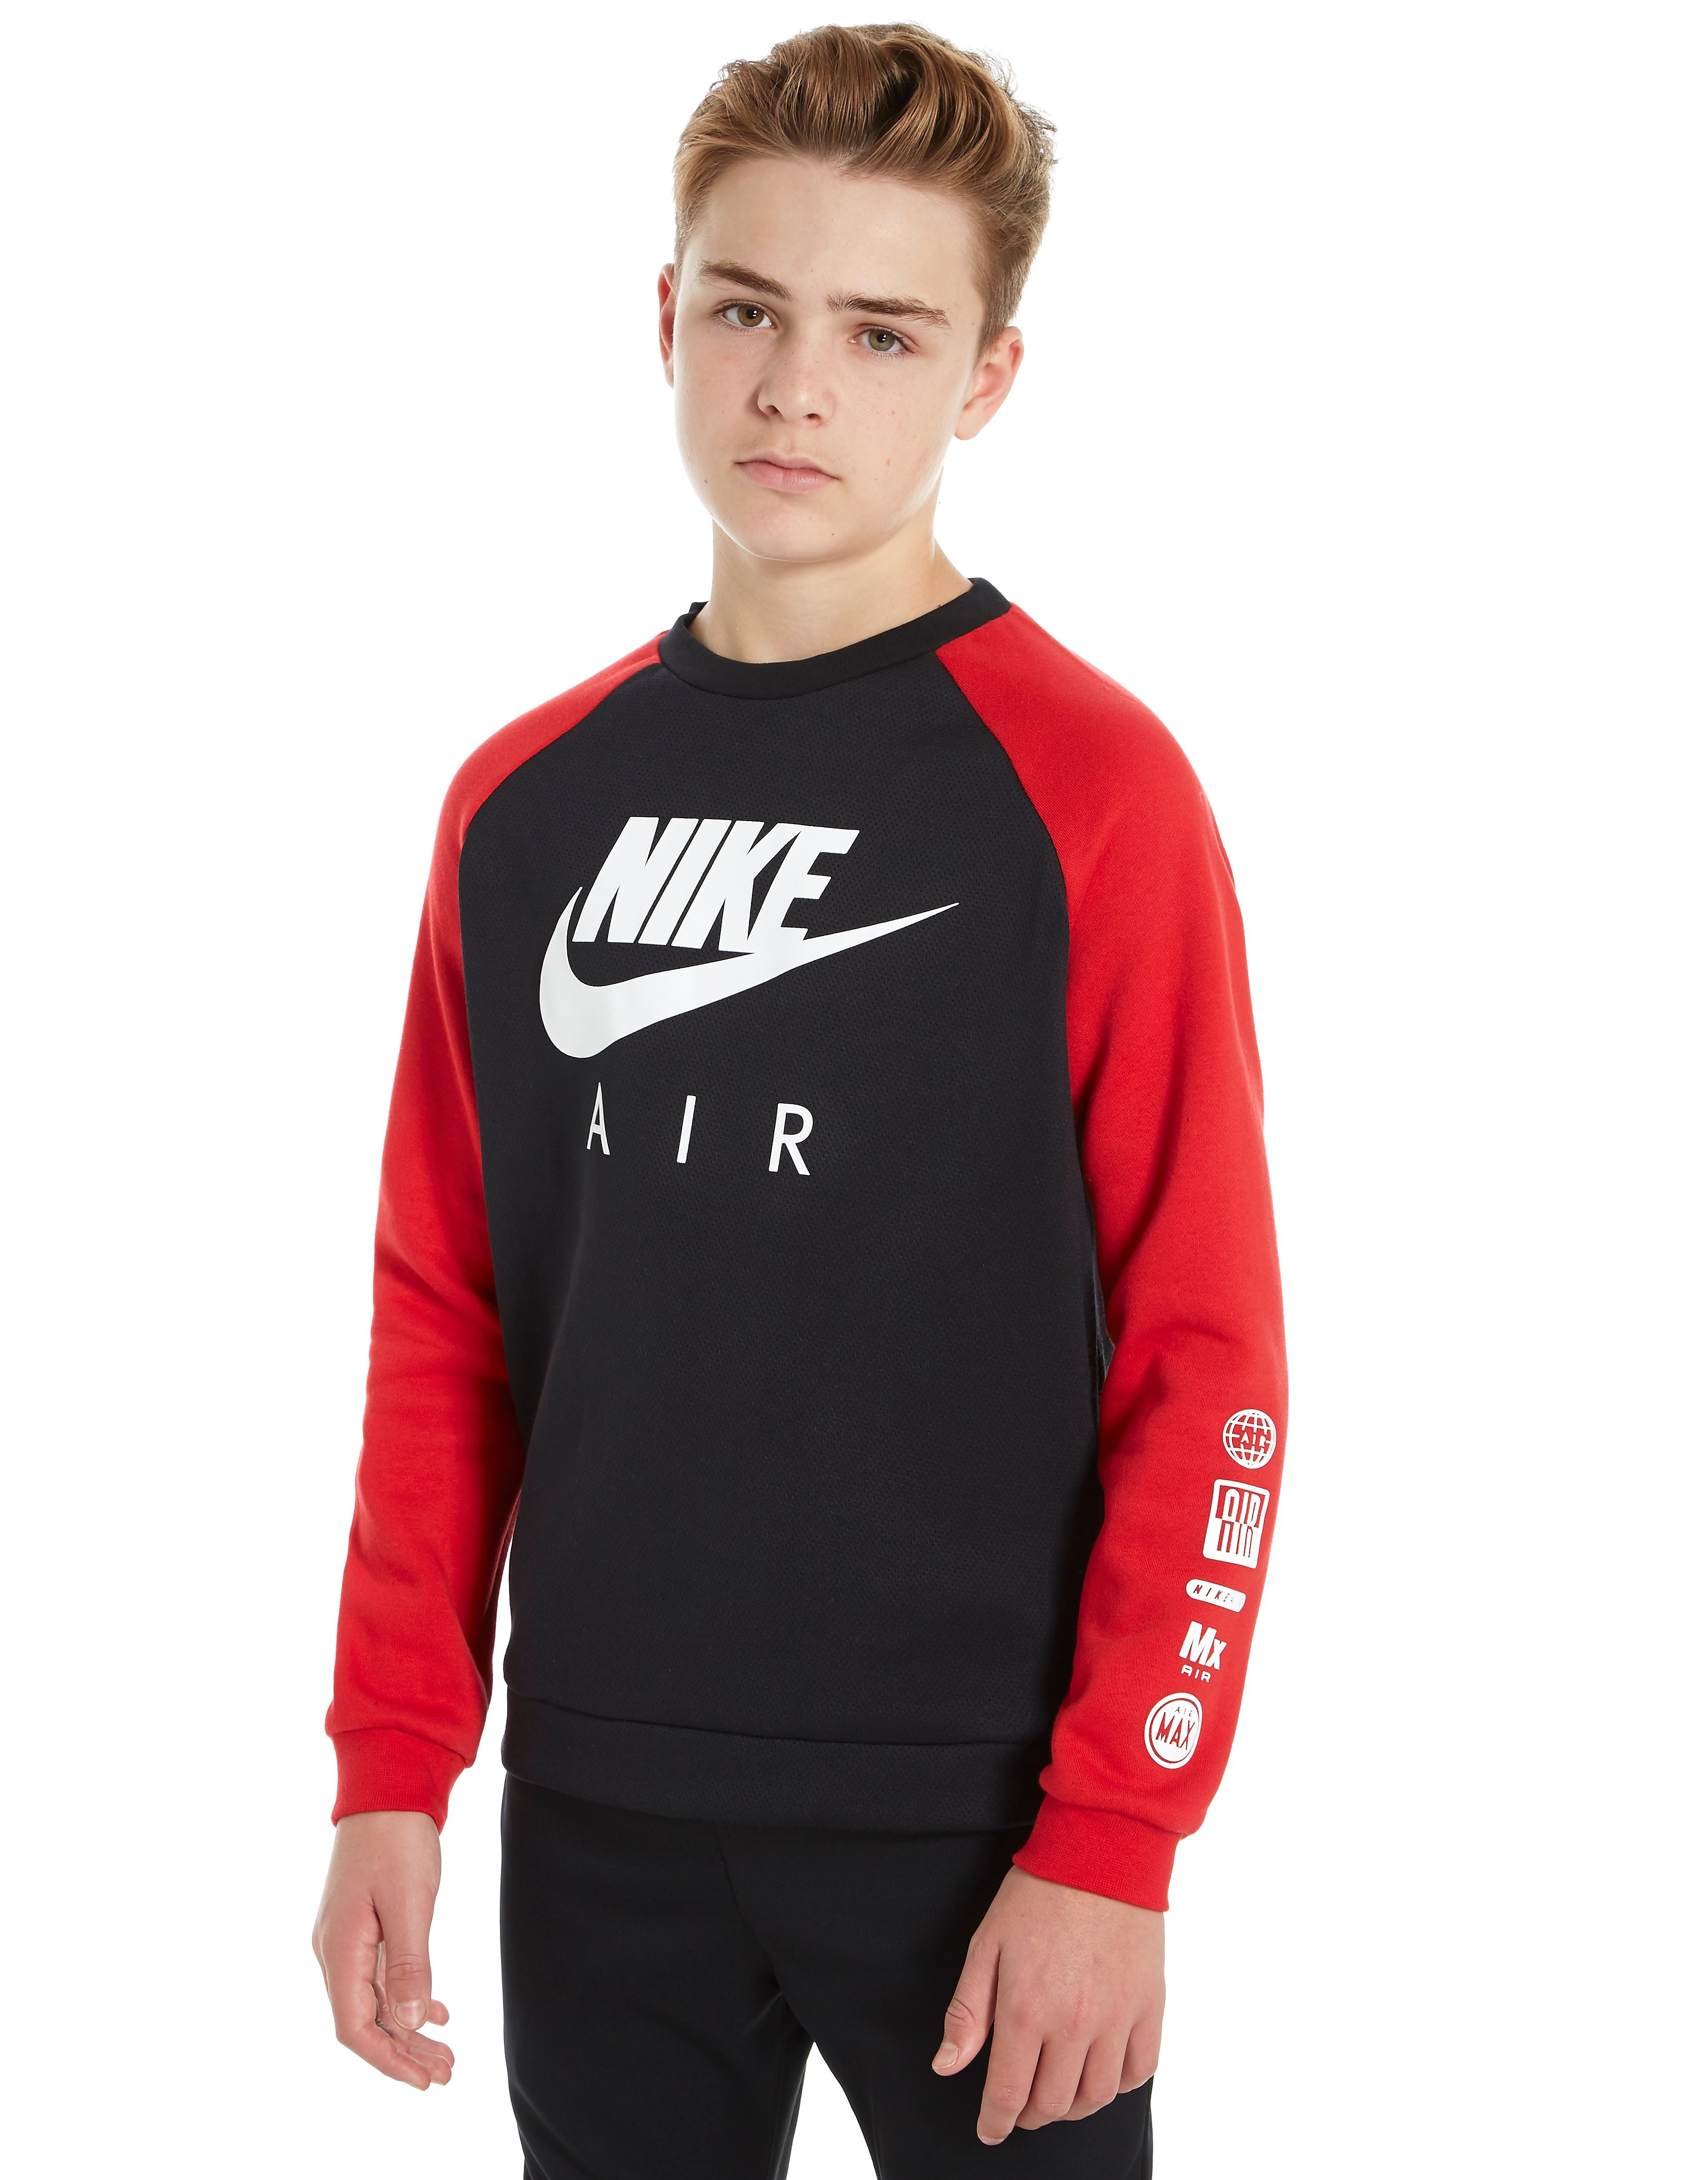 Nike Air Hybrid Crew Sweatshirt Junior